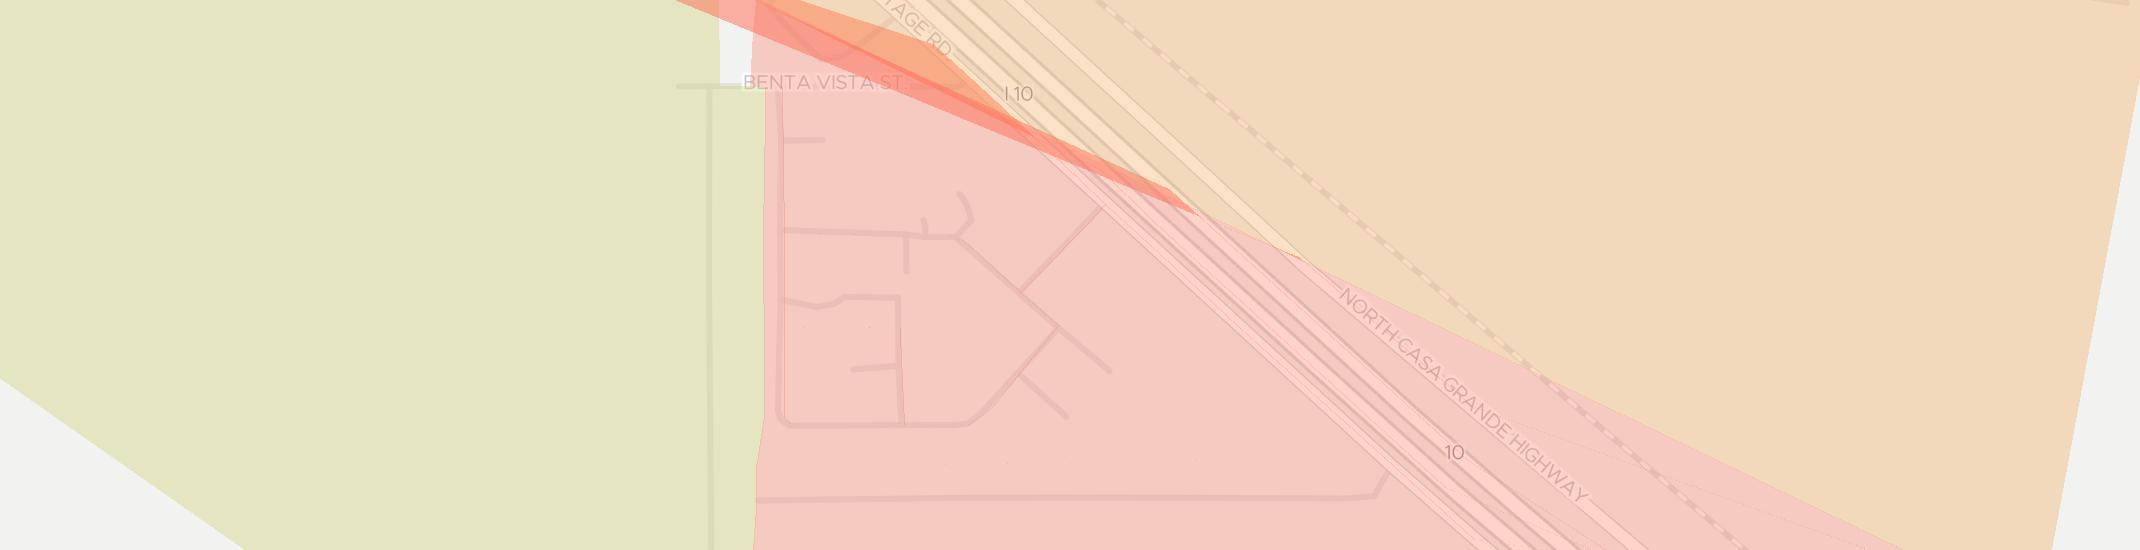 Rillito Internet Competition Map. Click for interactive map.